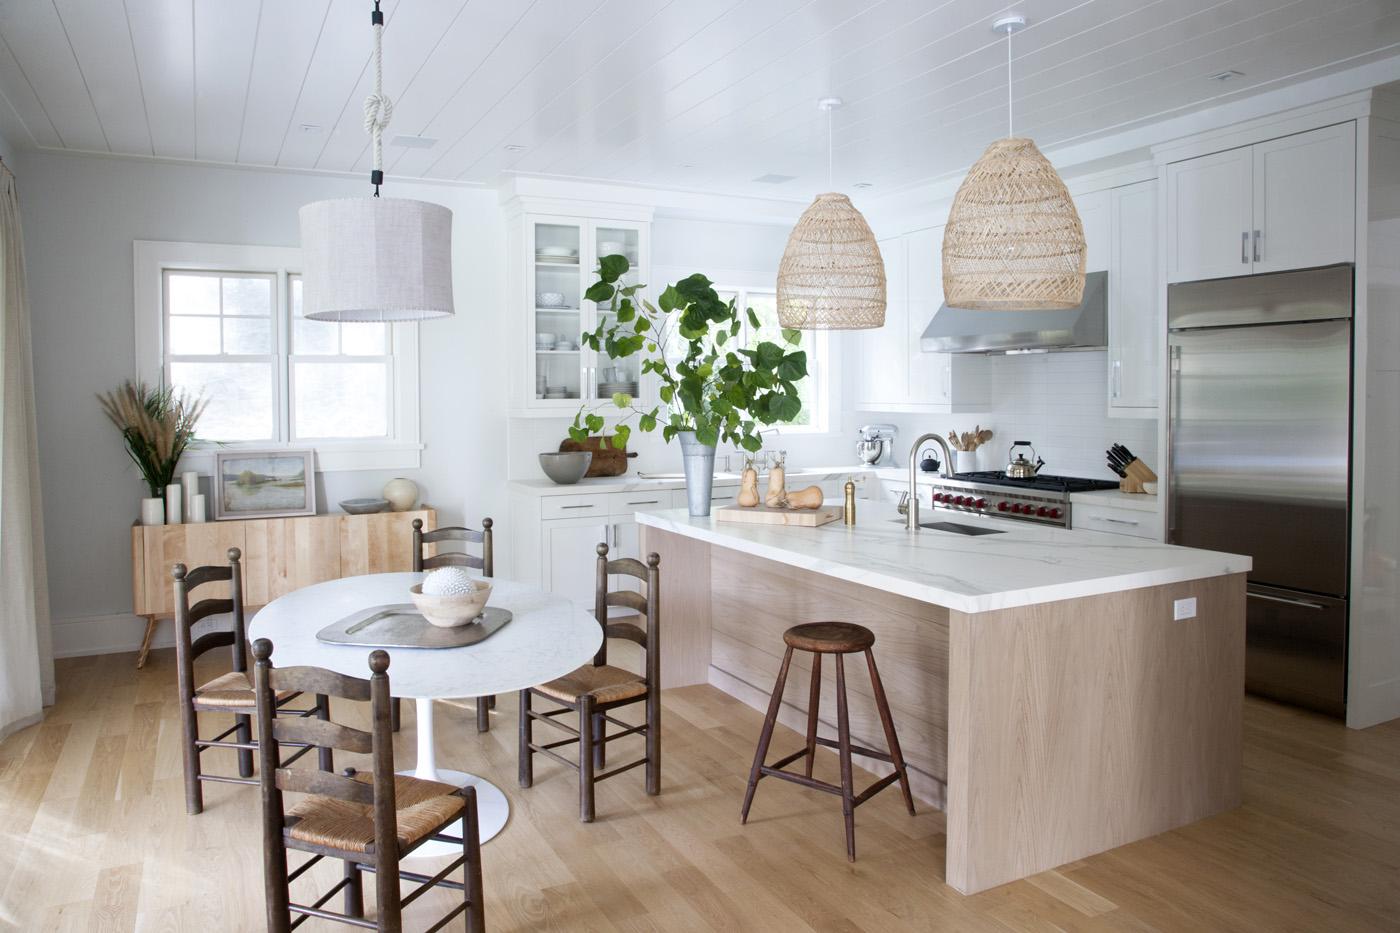 Farrin_West_Hamptons_Interior_Design_East_Hampton_Traditional_013.jpg